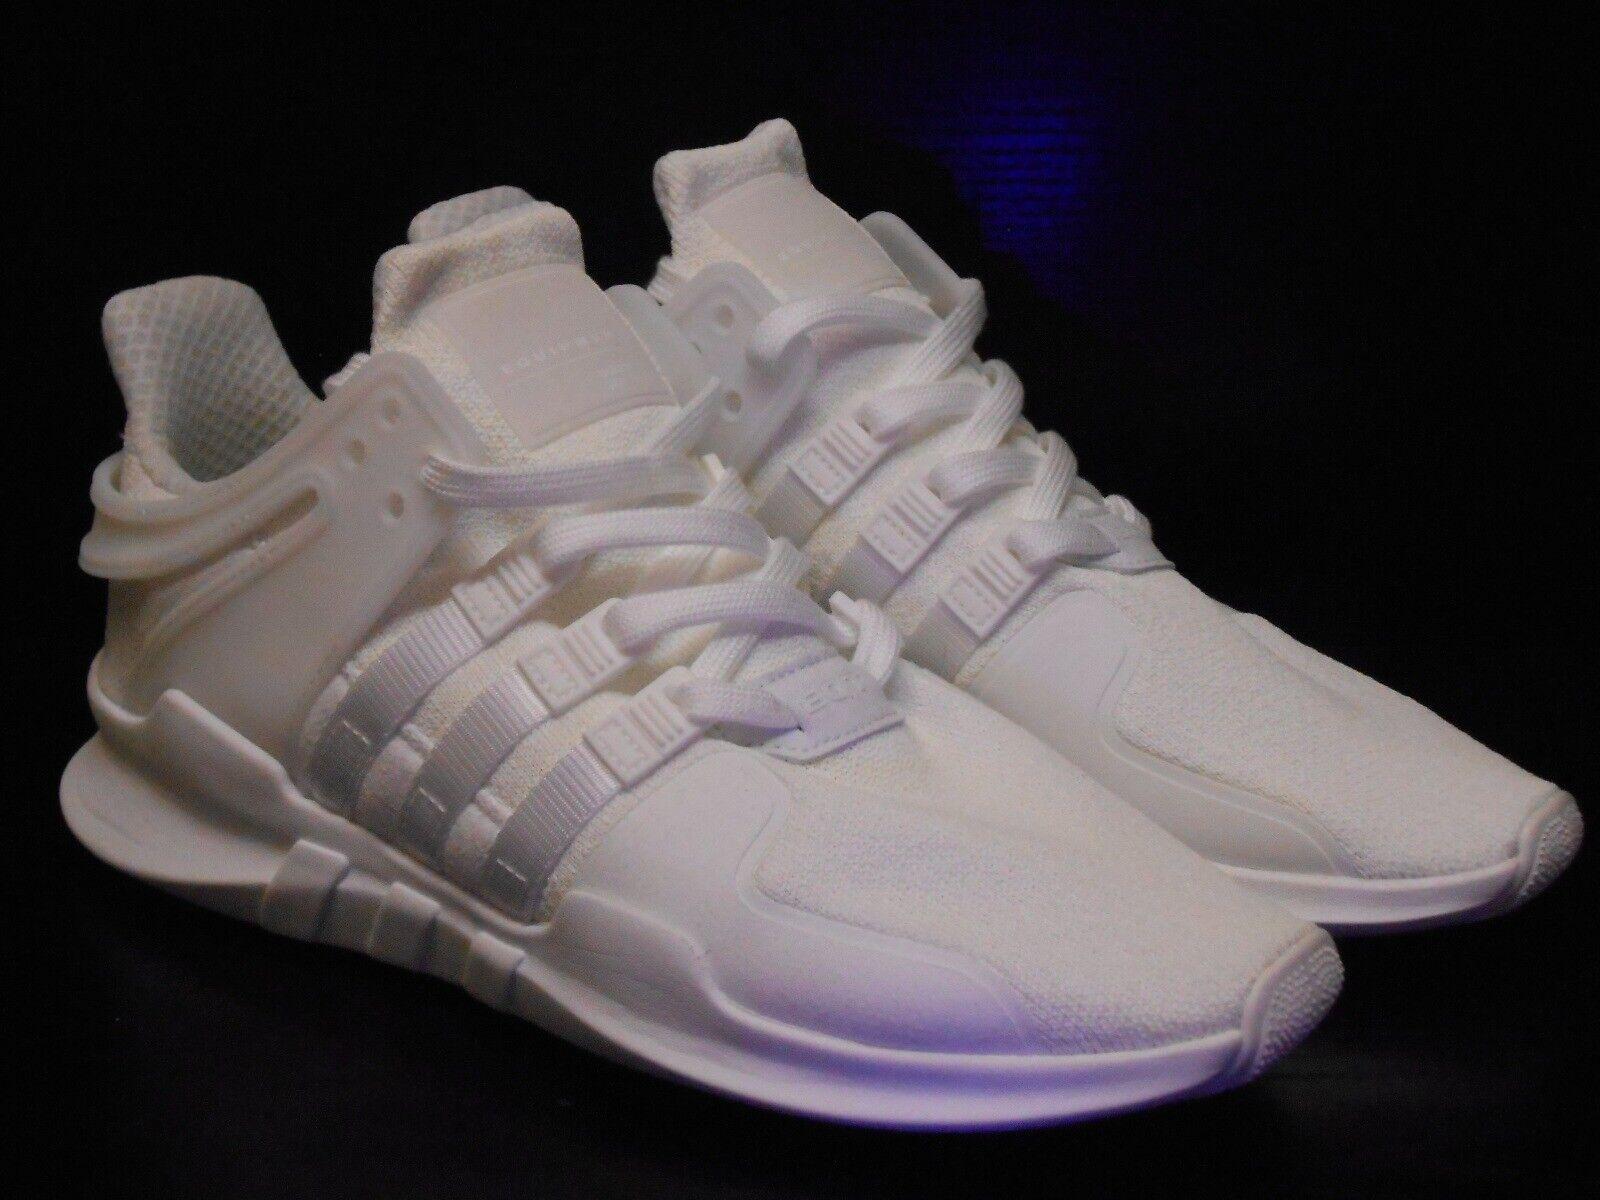 Adidas Equipment Support Adv CP9558